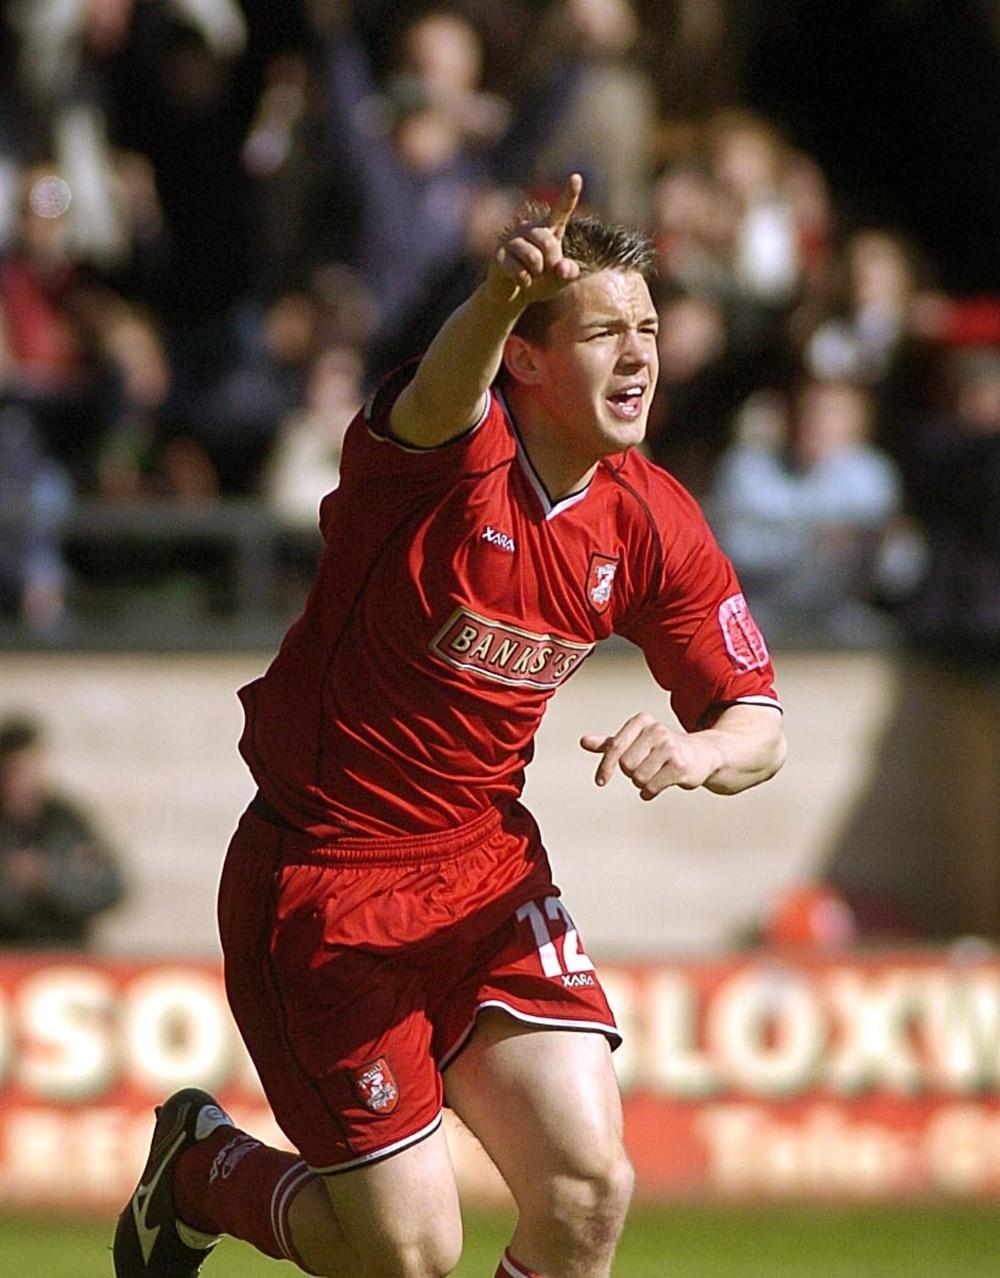 Former Walsall, Leicester City striker Matty Fryatt retires from football